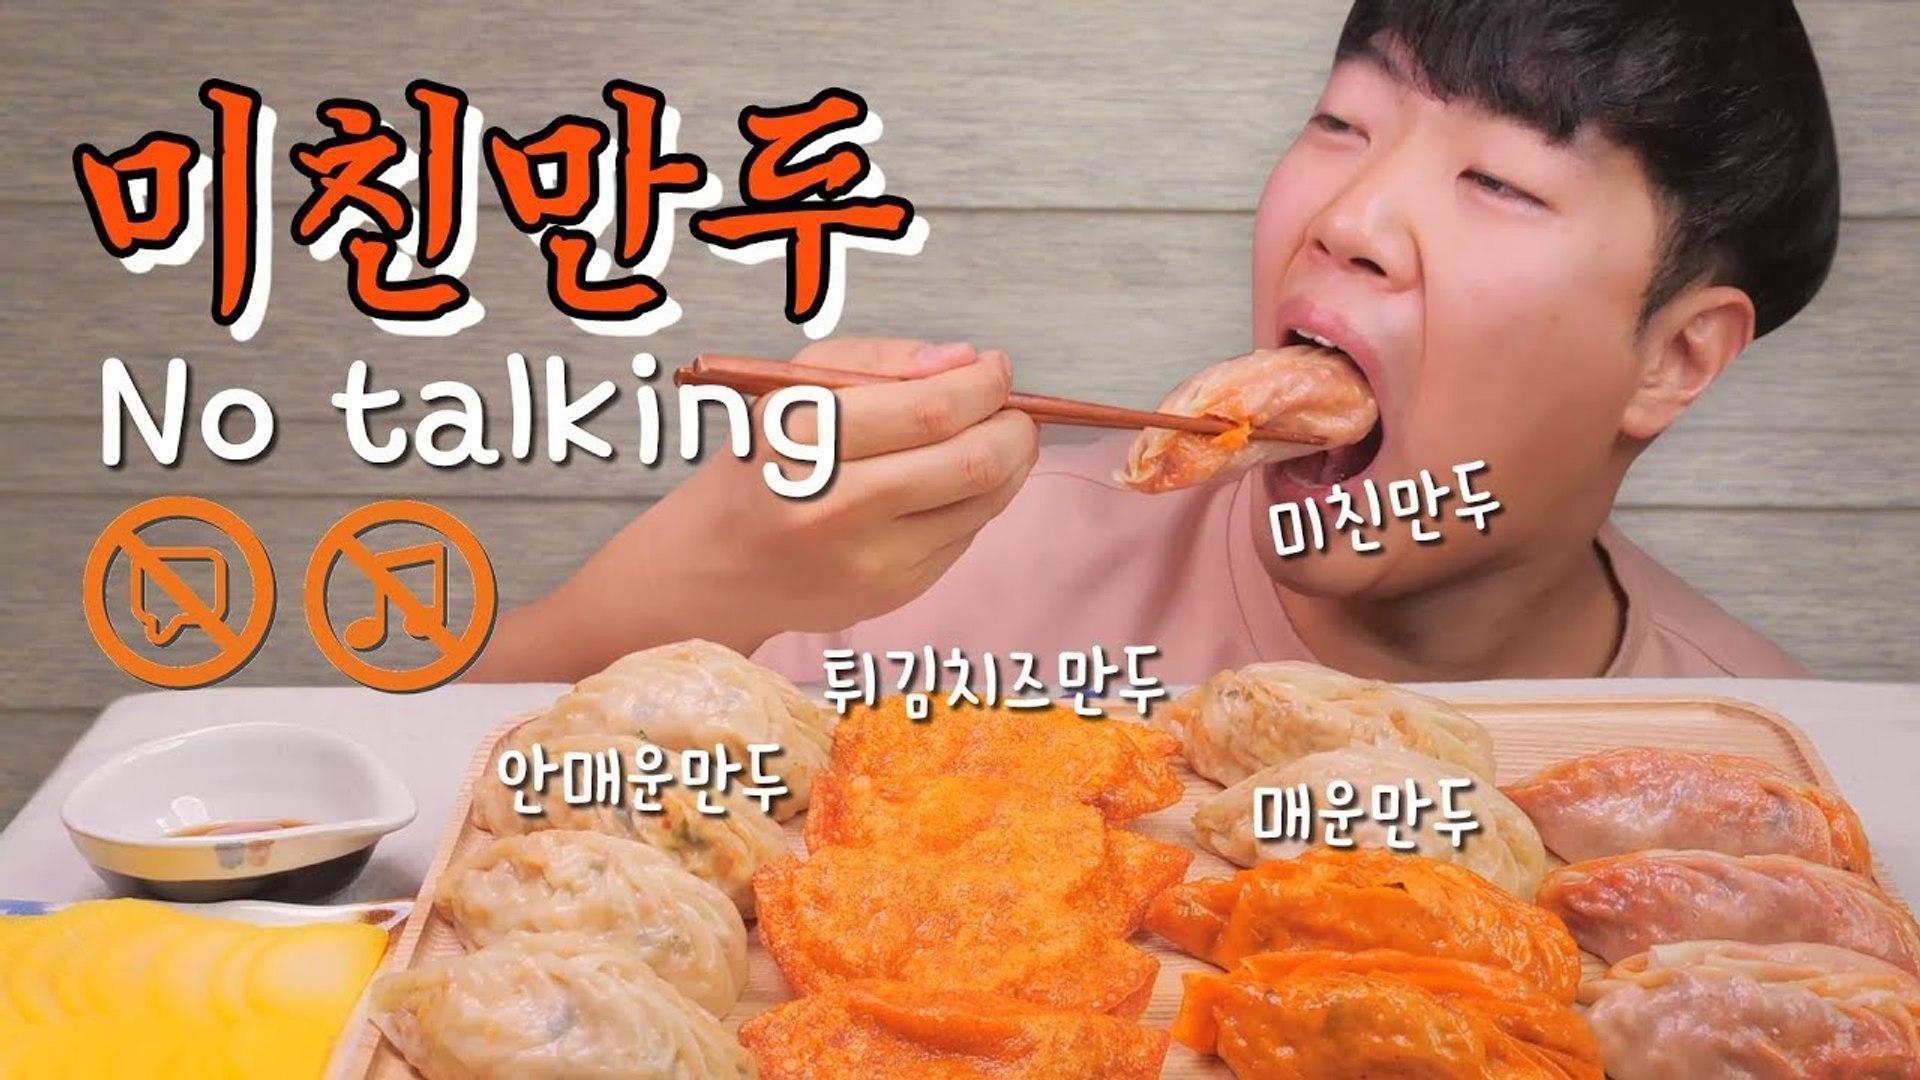 Crazy dumpling that most spicy in Korea Eating sound ASMR *No talking 청주 미친만두 이팅사운드 ASMR 말없음